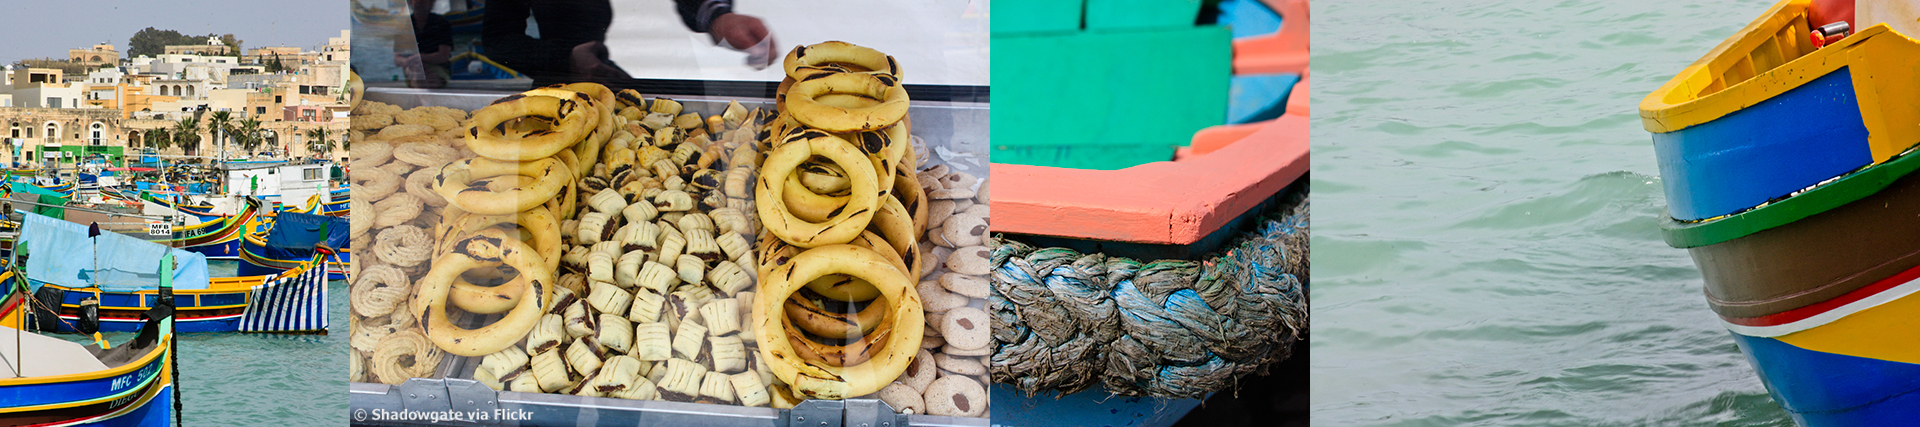 Marsaxlokk Market 3